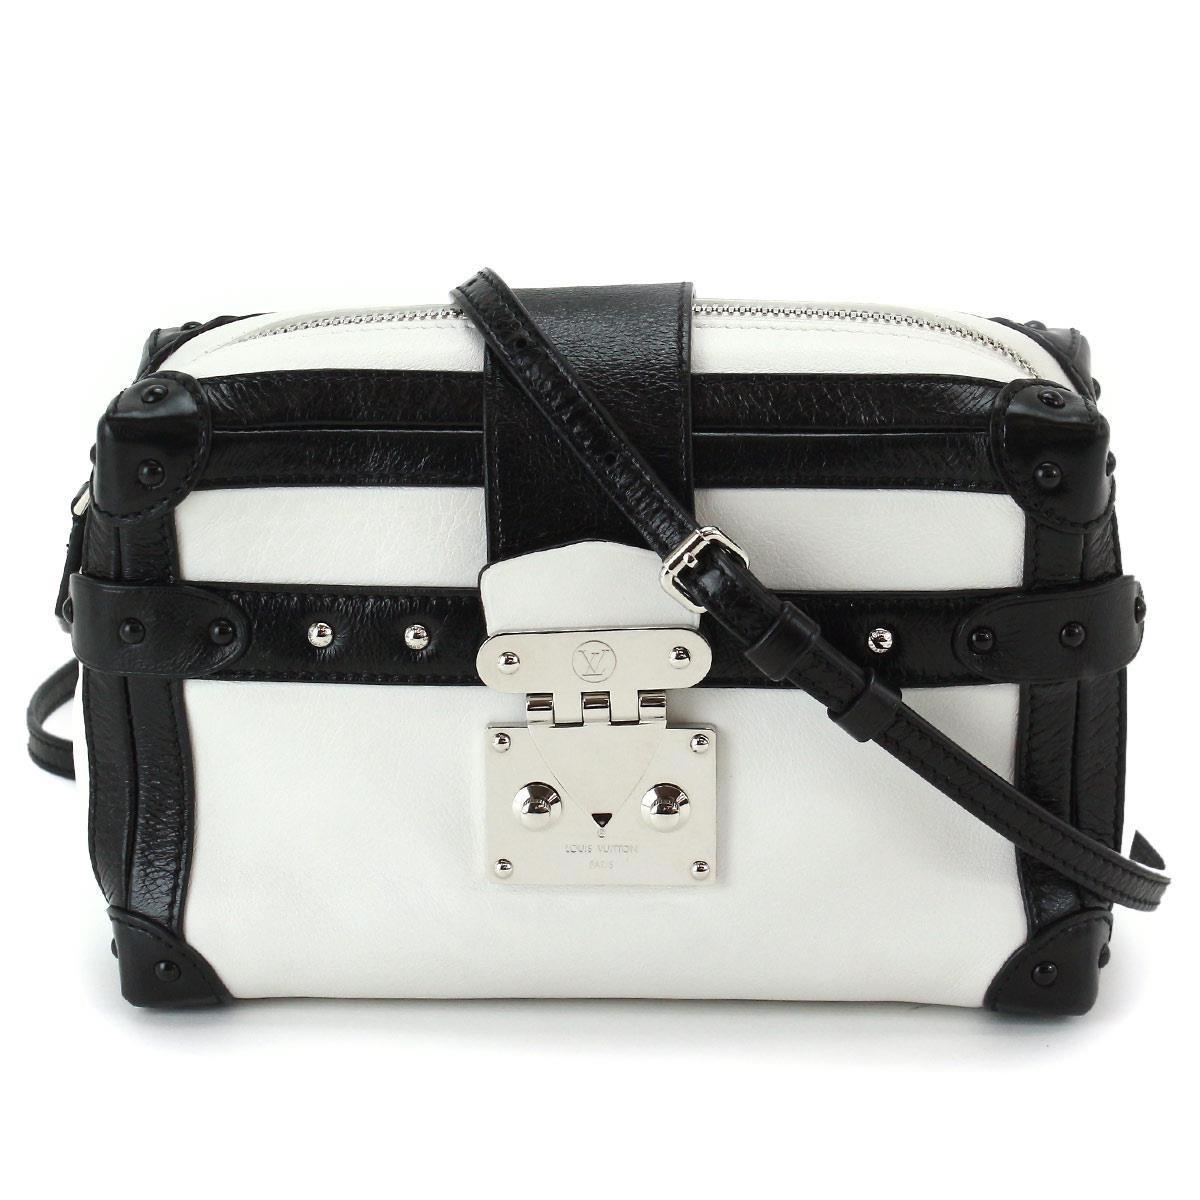 a93e0538cf4a Gallery. Previously sold at  Reebonz · Women s Box Bags Women s Louis  Vuitton Petite Malle